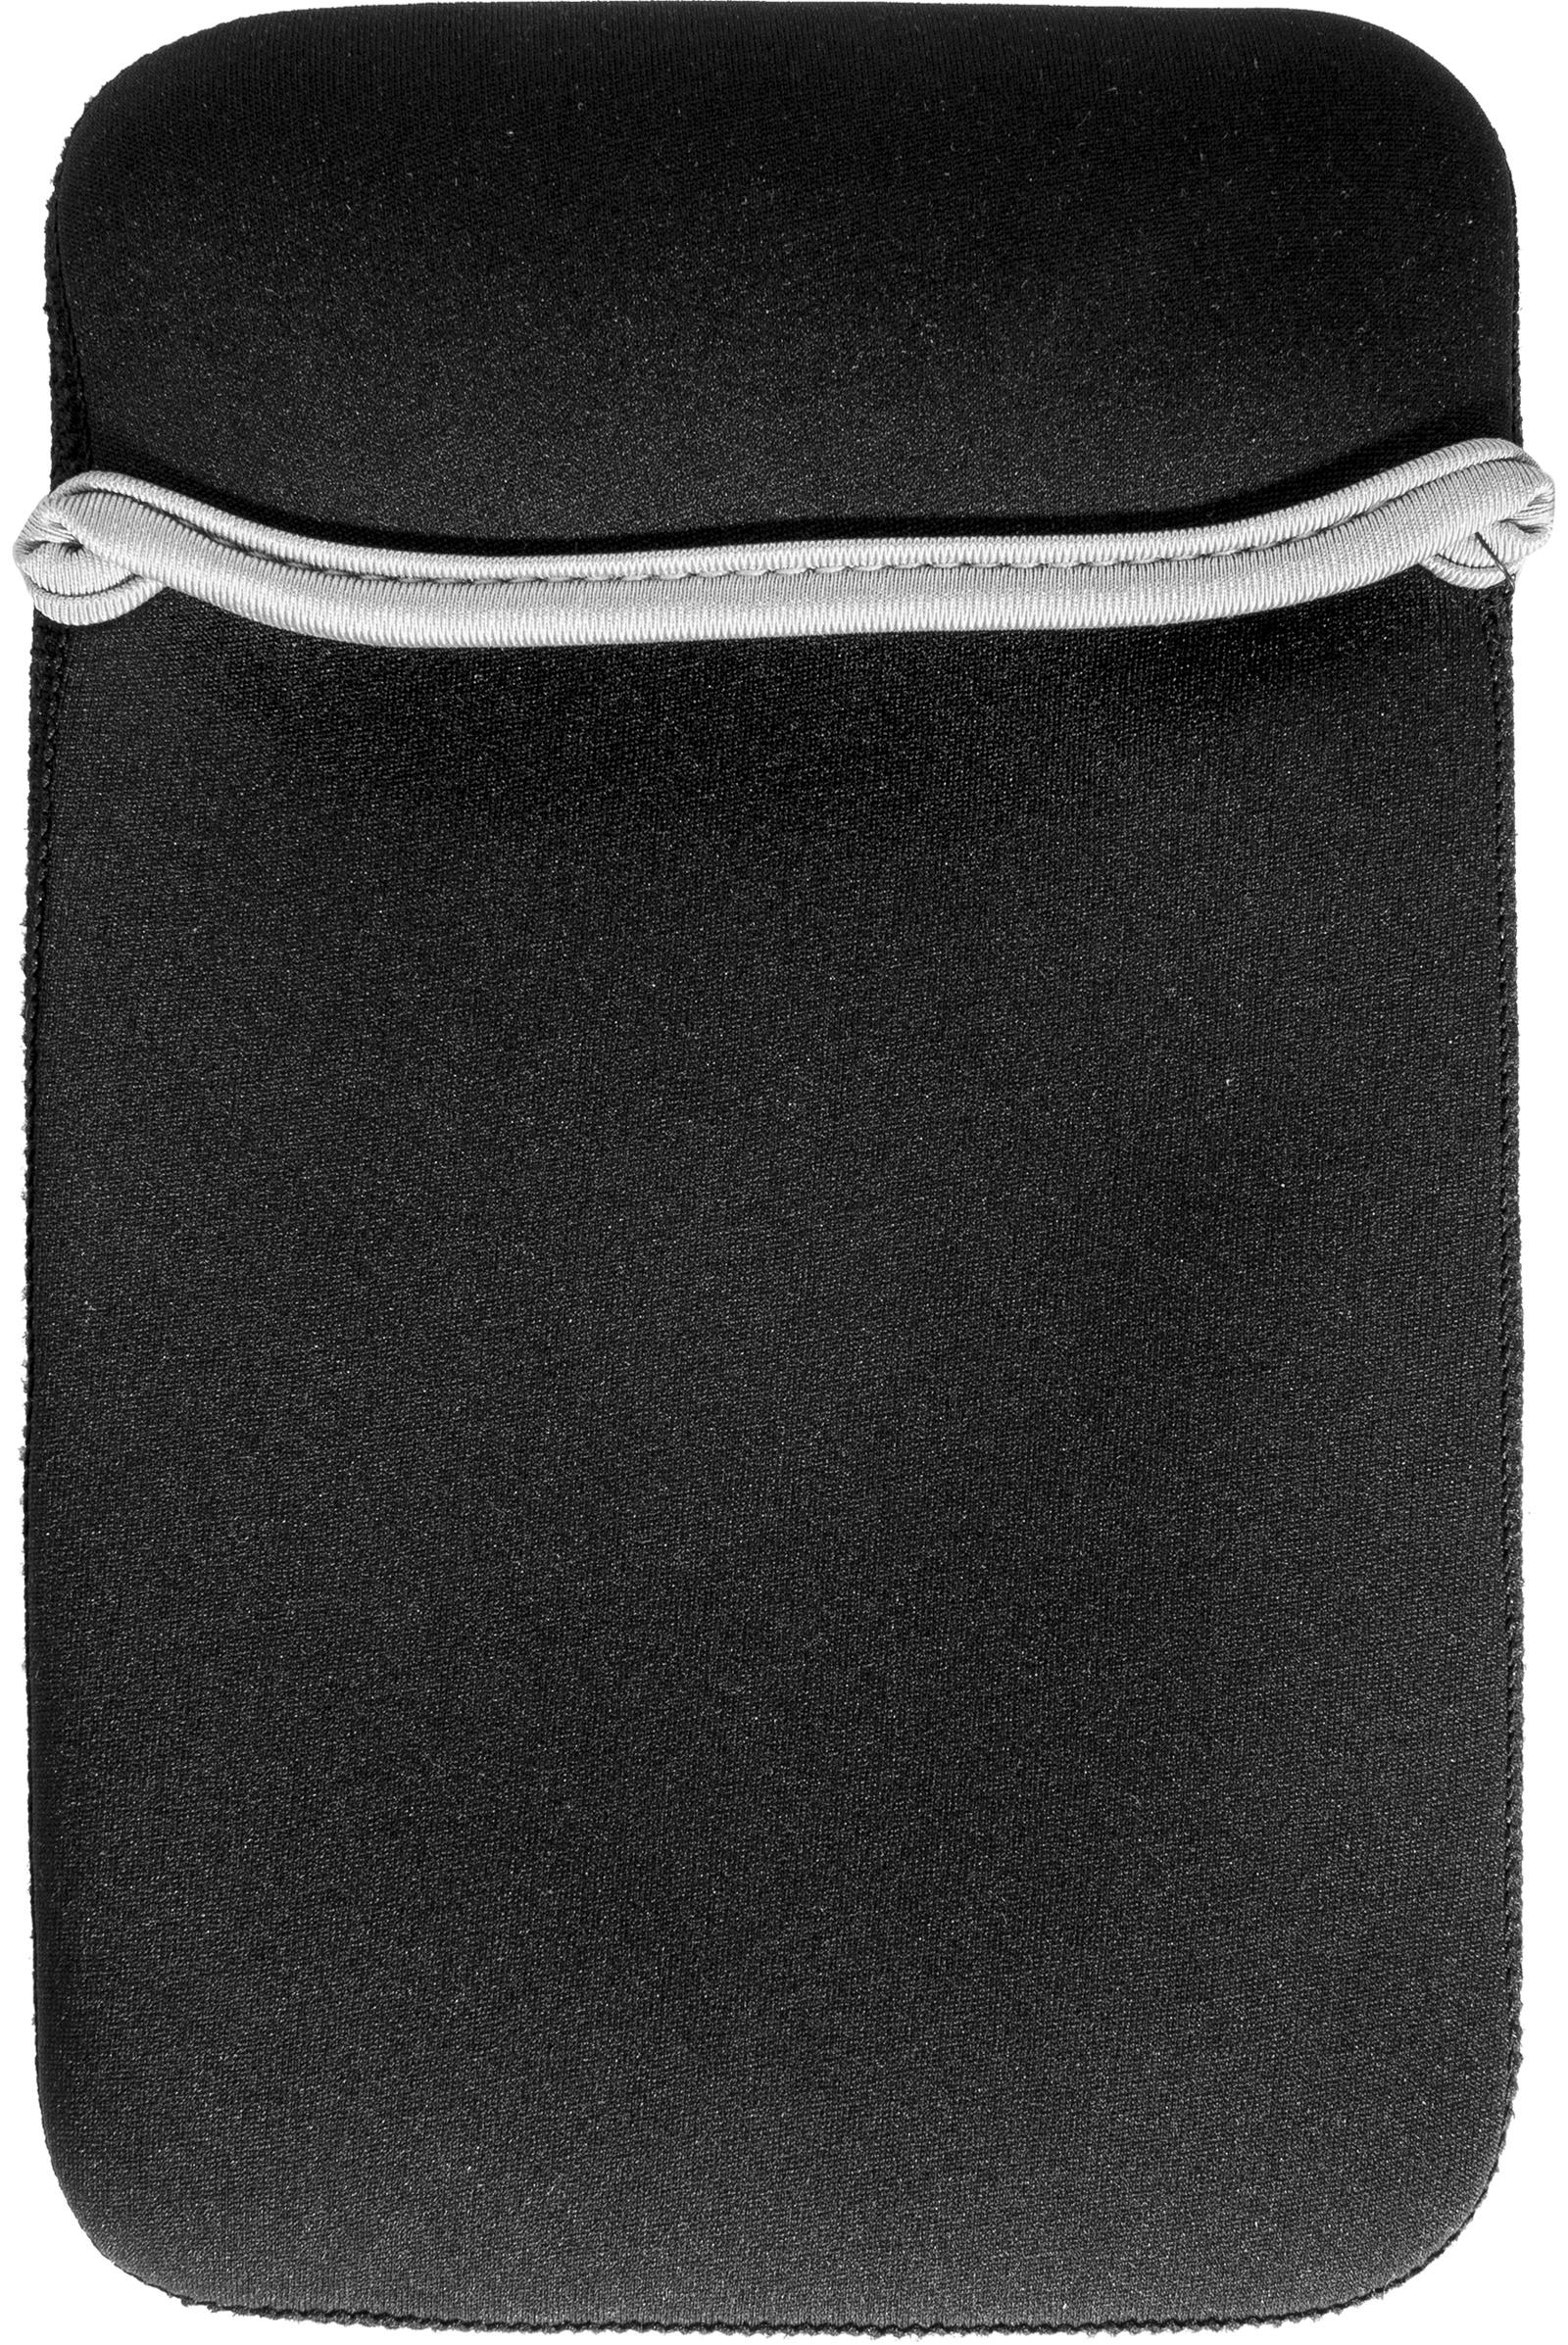 Чехол для планшета Defender Tablet fur uni, 26013 цена